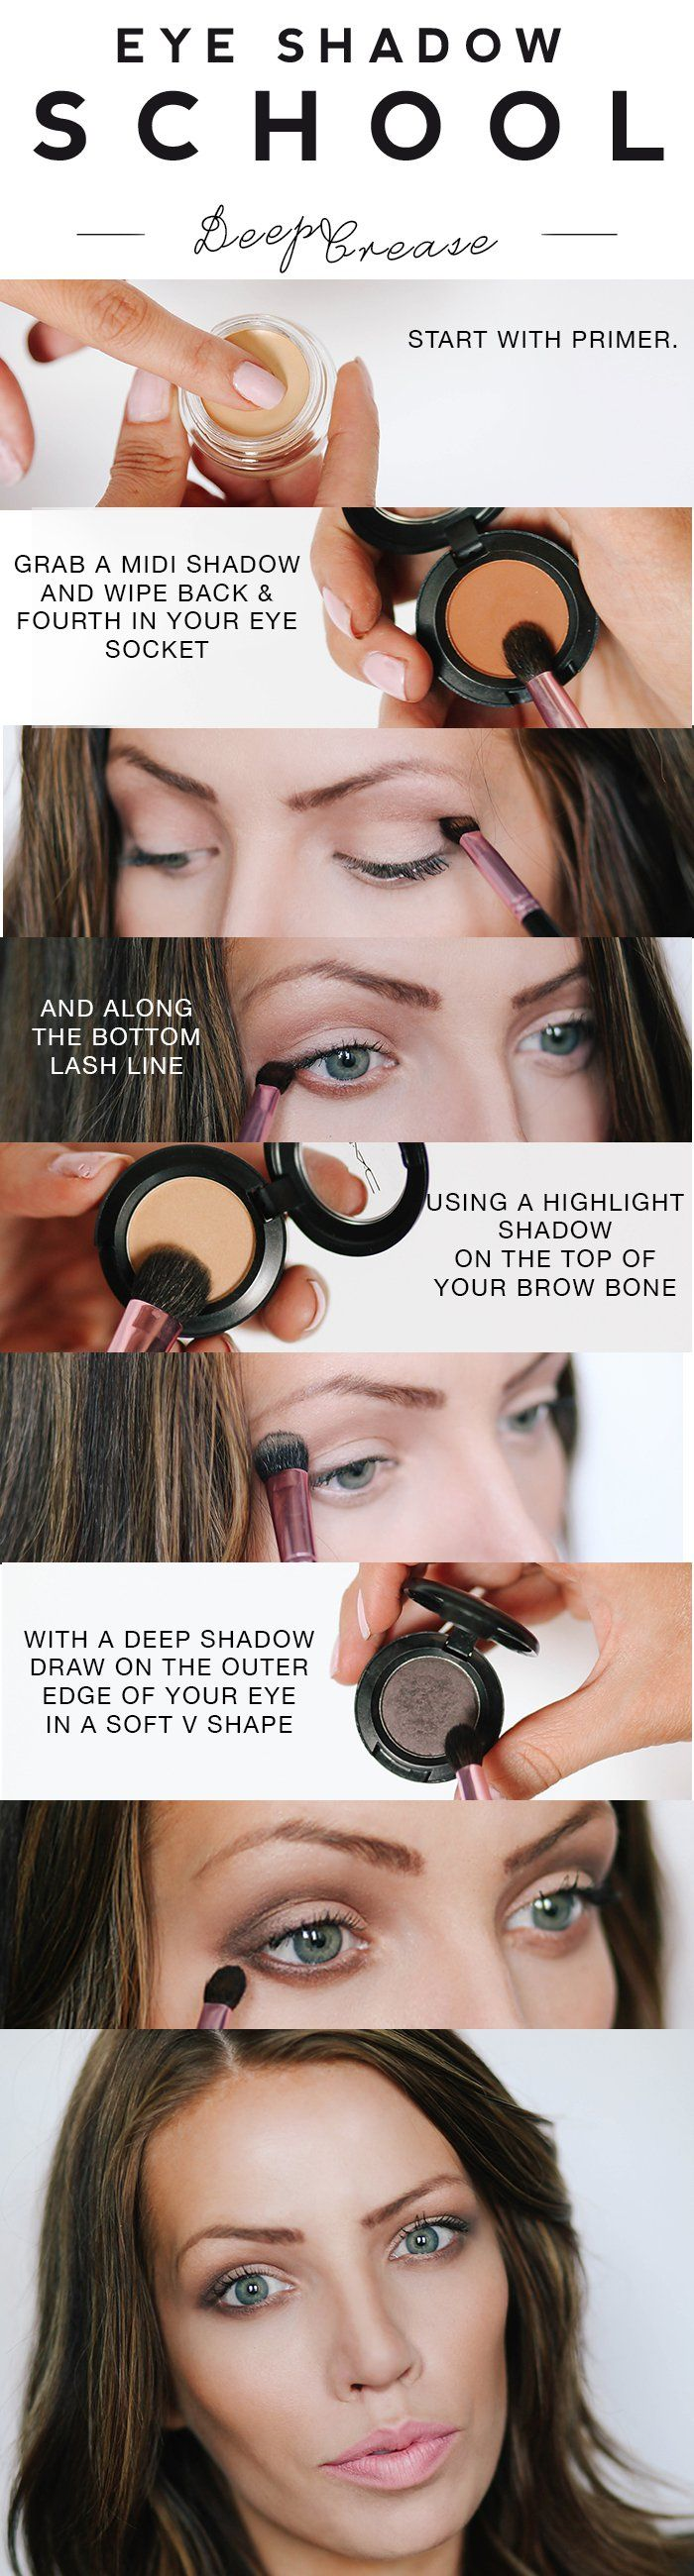 Eyeshadow for School